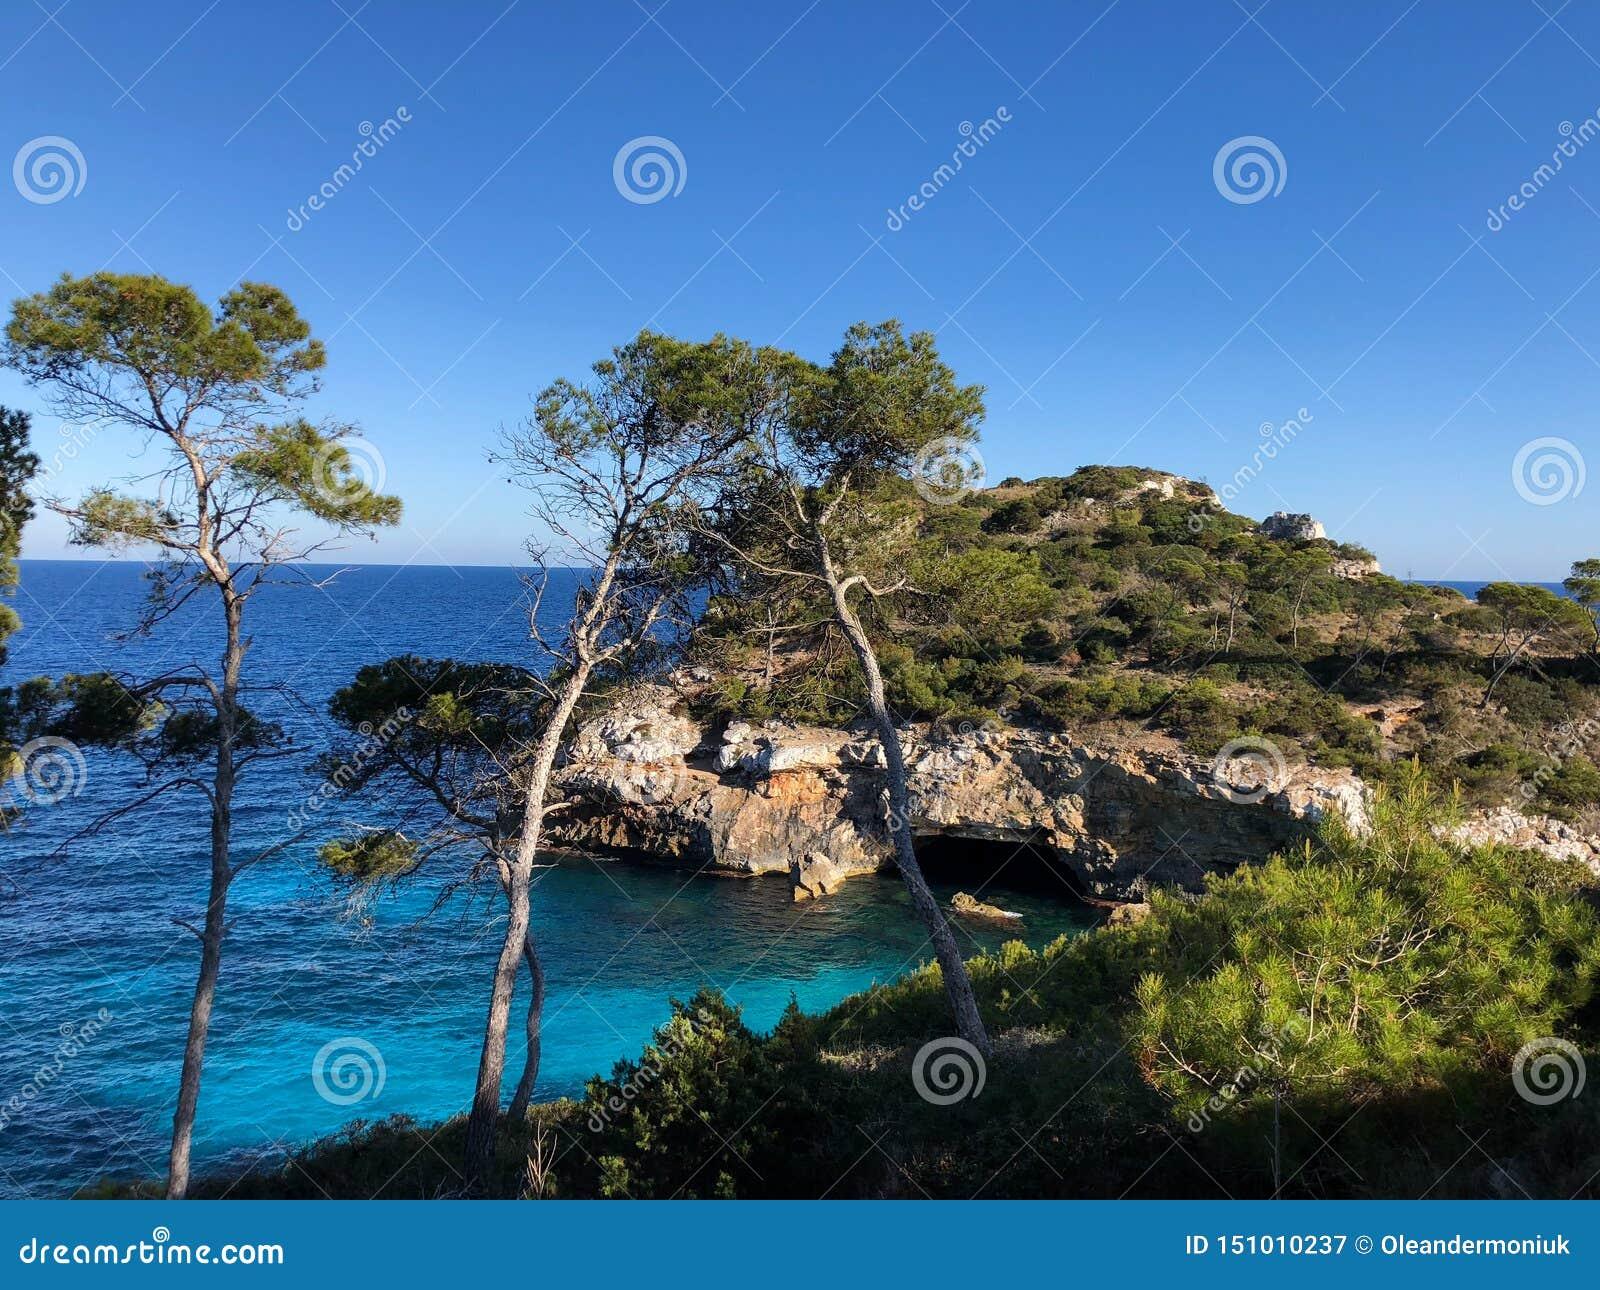 Playa DE Formentor Cala Pi DE La Posada, mooi strand bij GLB Formentor, Palma Mallorca, Spanje